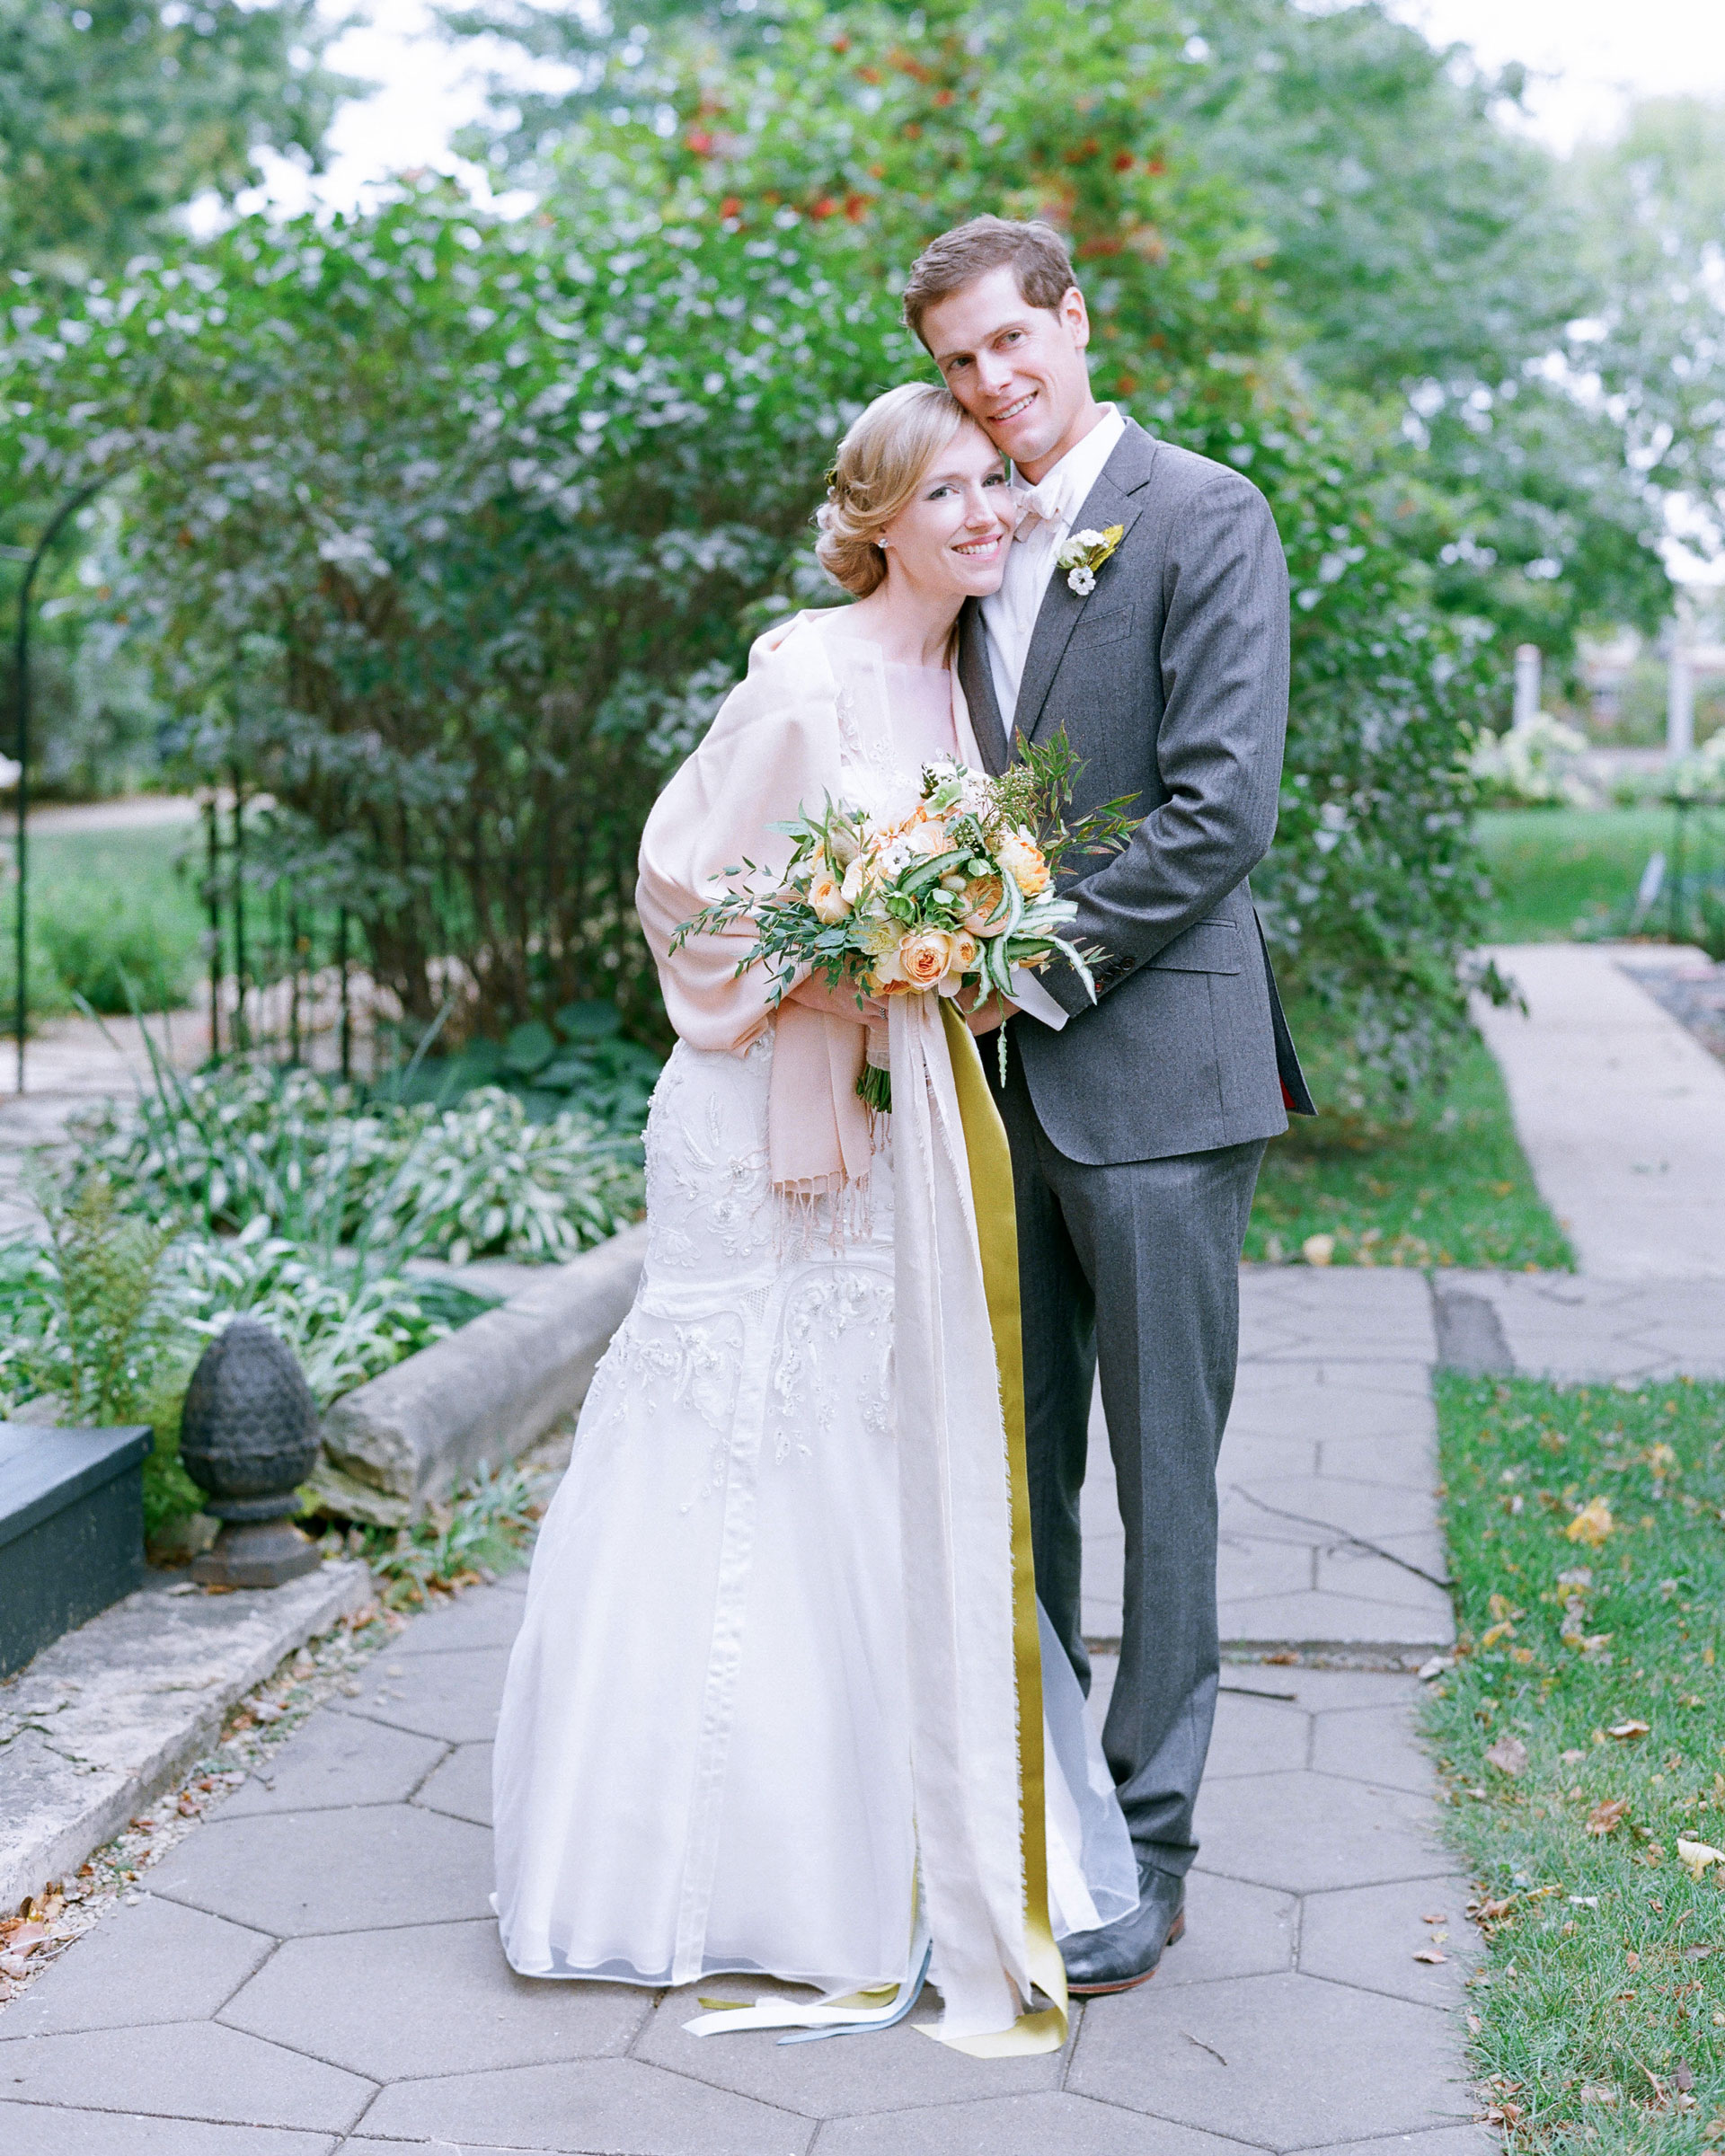 adrienne-jason-wedding-minnesota-couple-0013-s111925.jpg